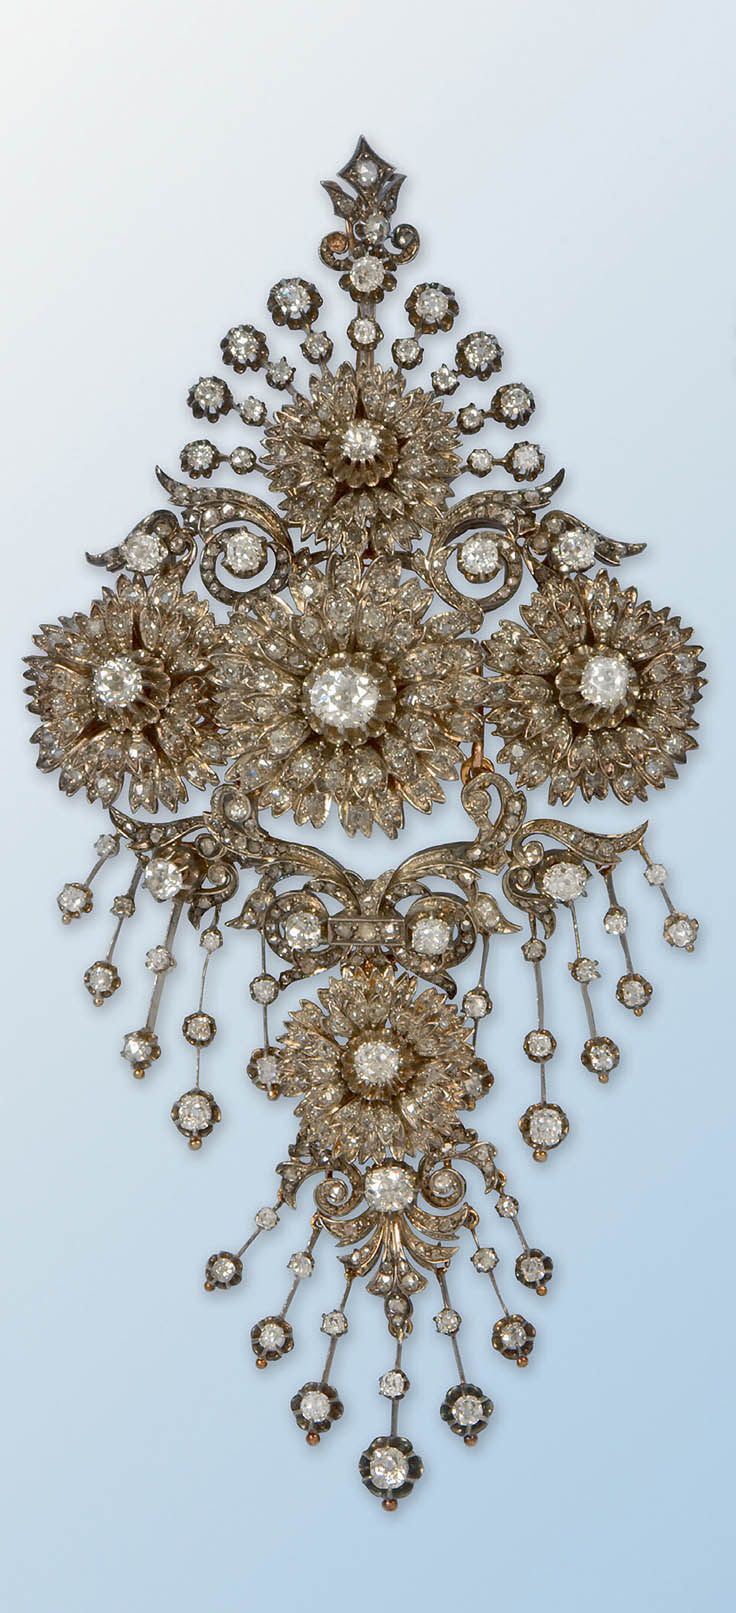 Brooches Diamond Bodice Prnament Brooch France 19th